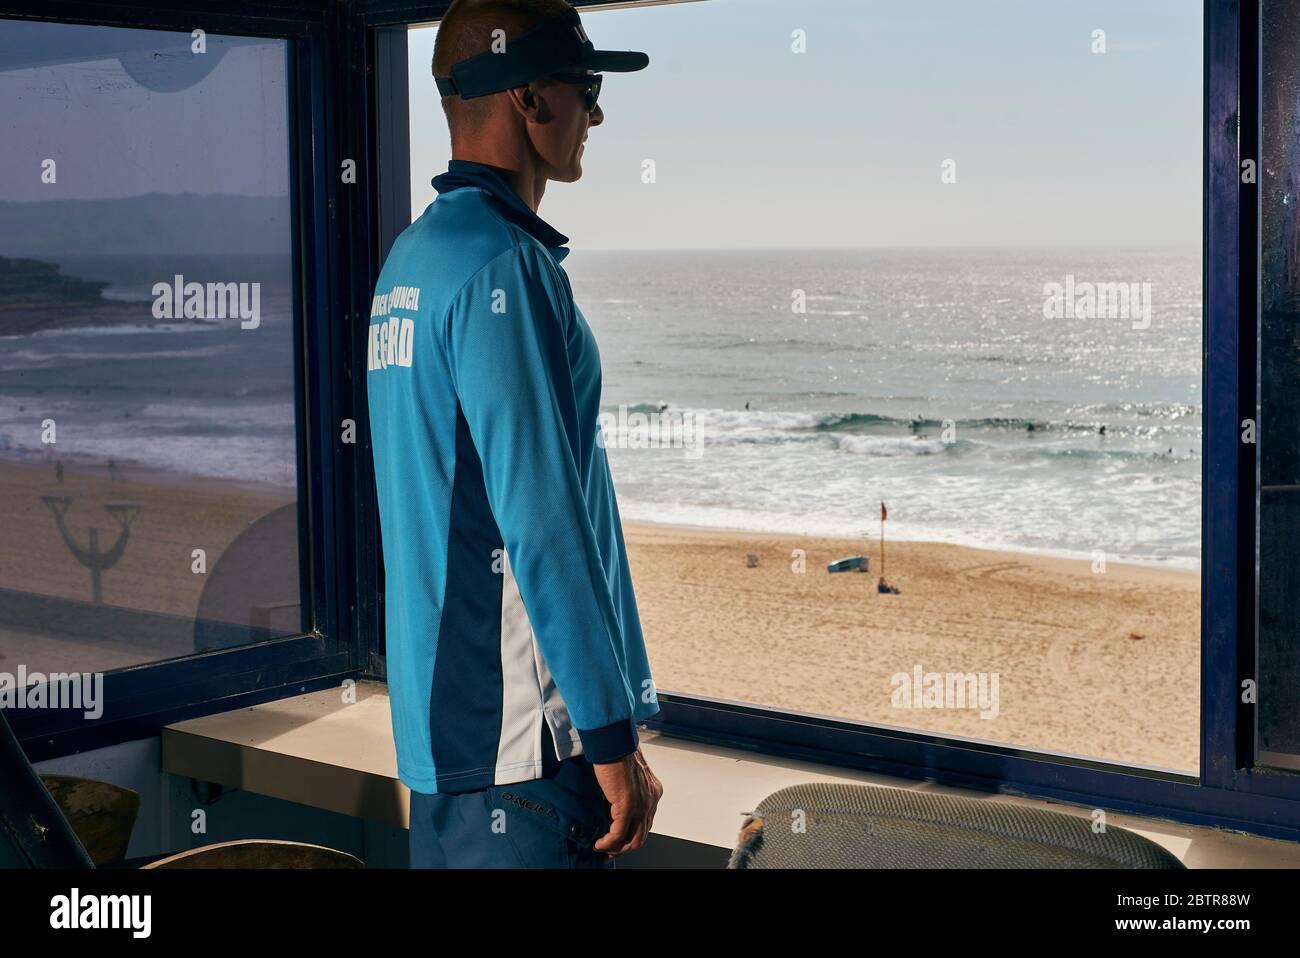 Lifeguard service at the Maroubra beach in Sydney, Australia Stock Photo